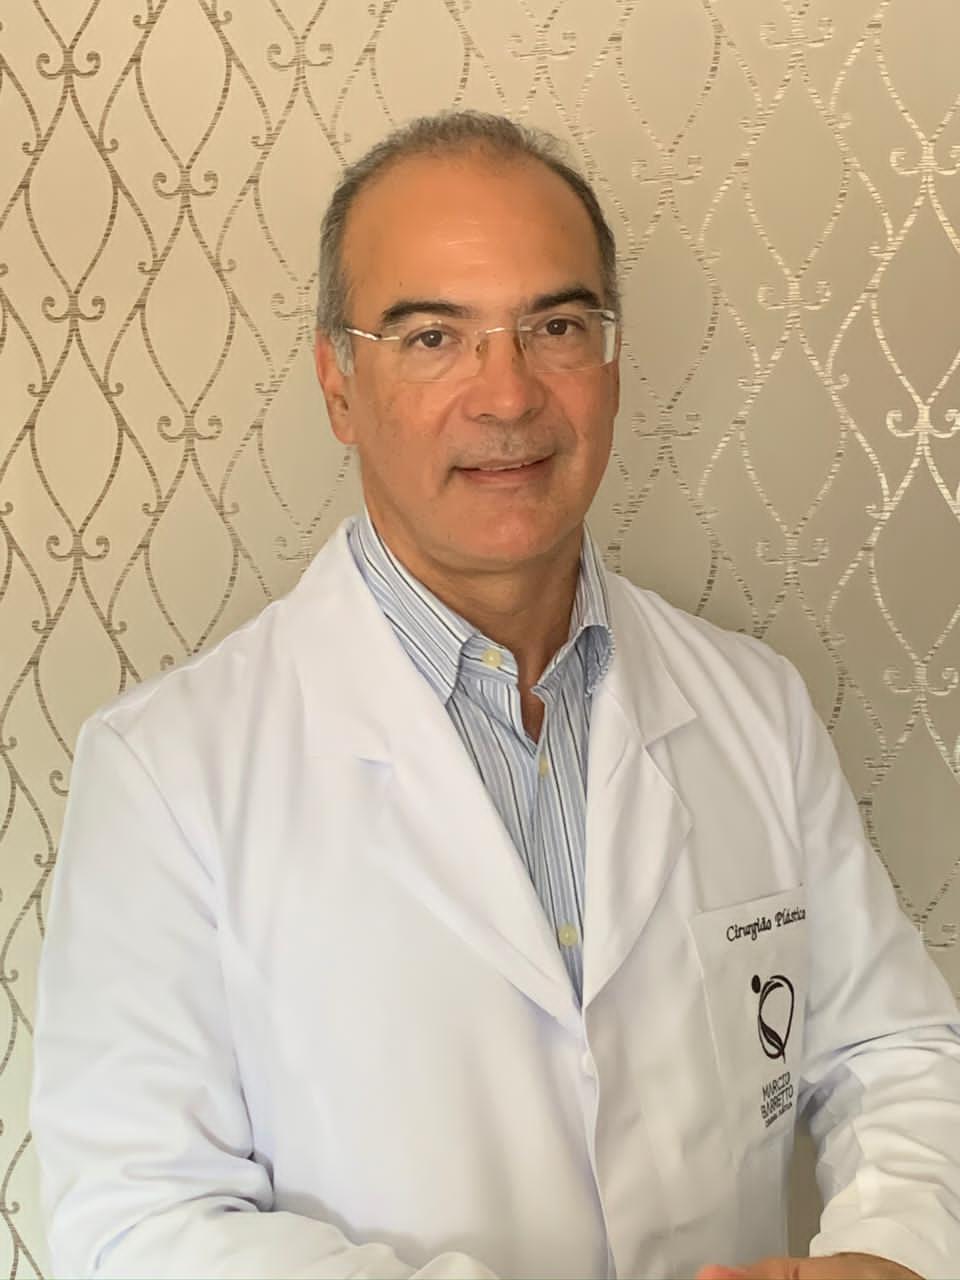 dr. marcio.jpg